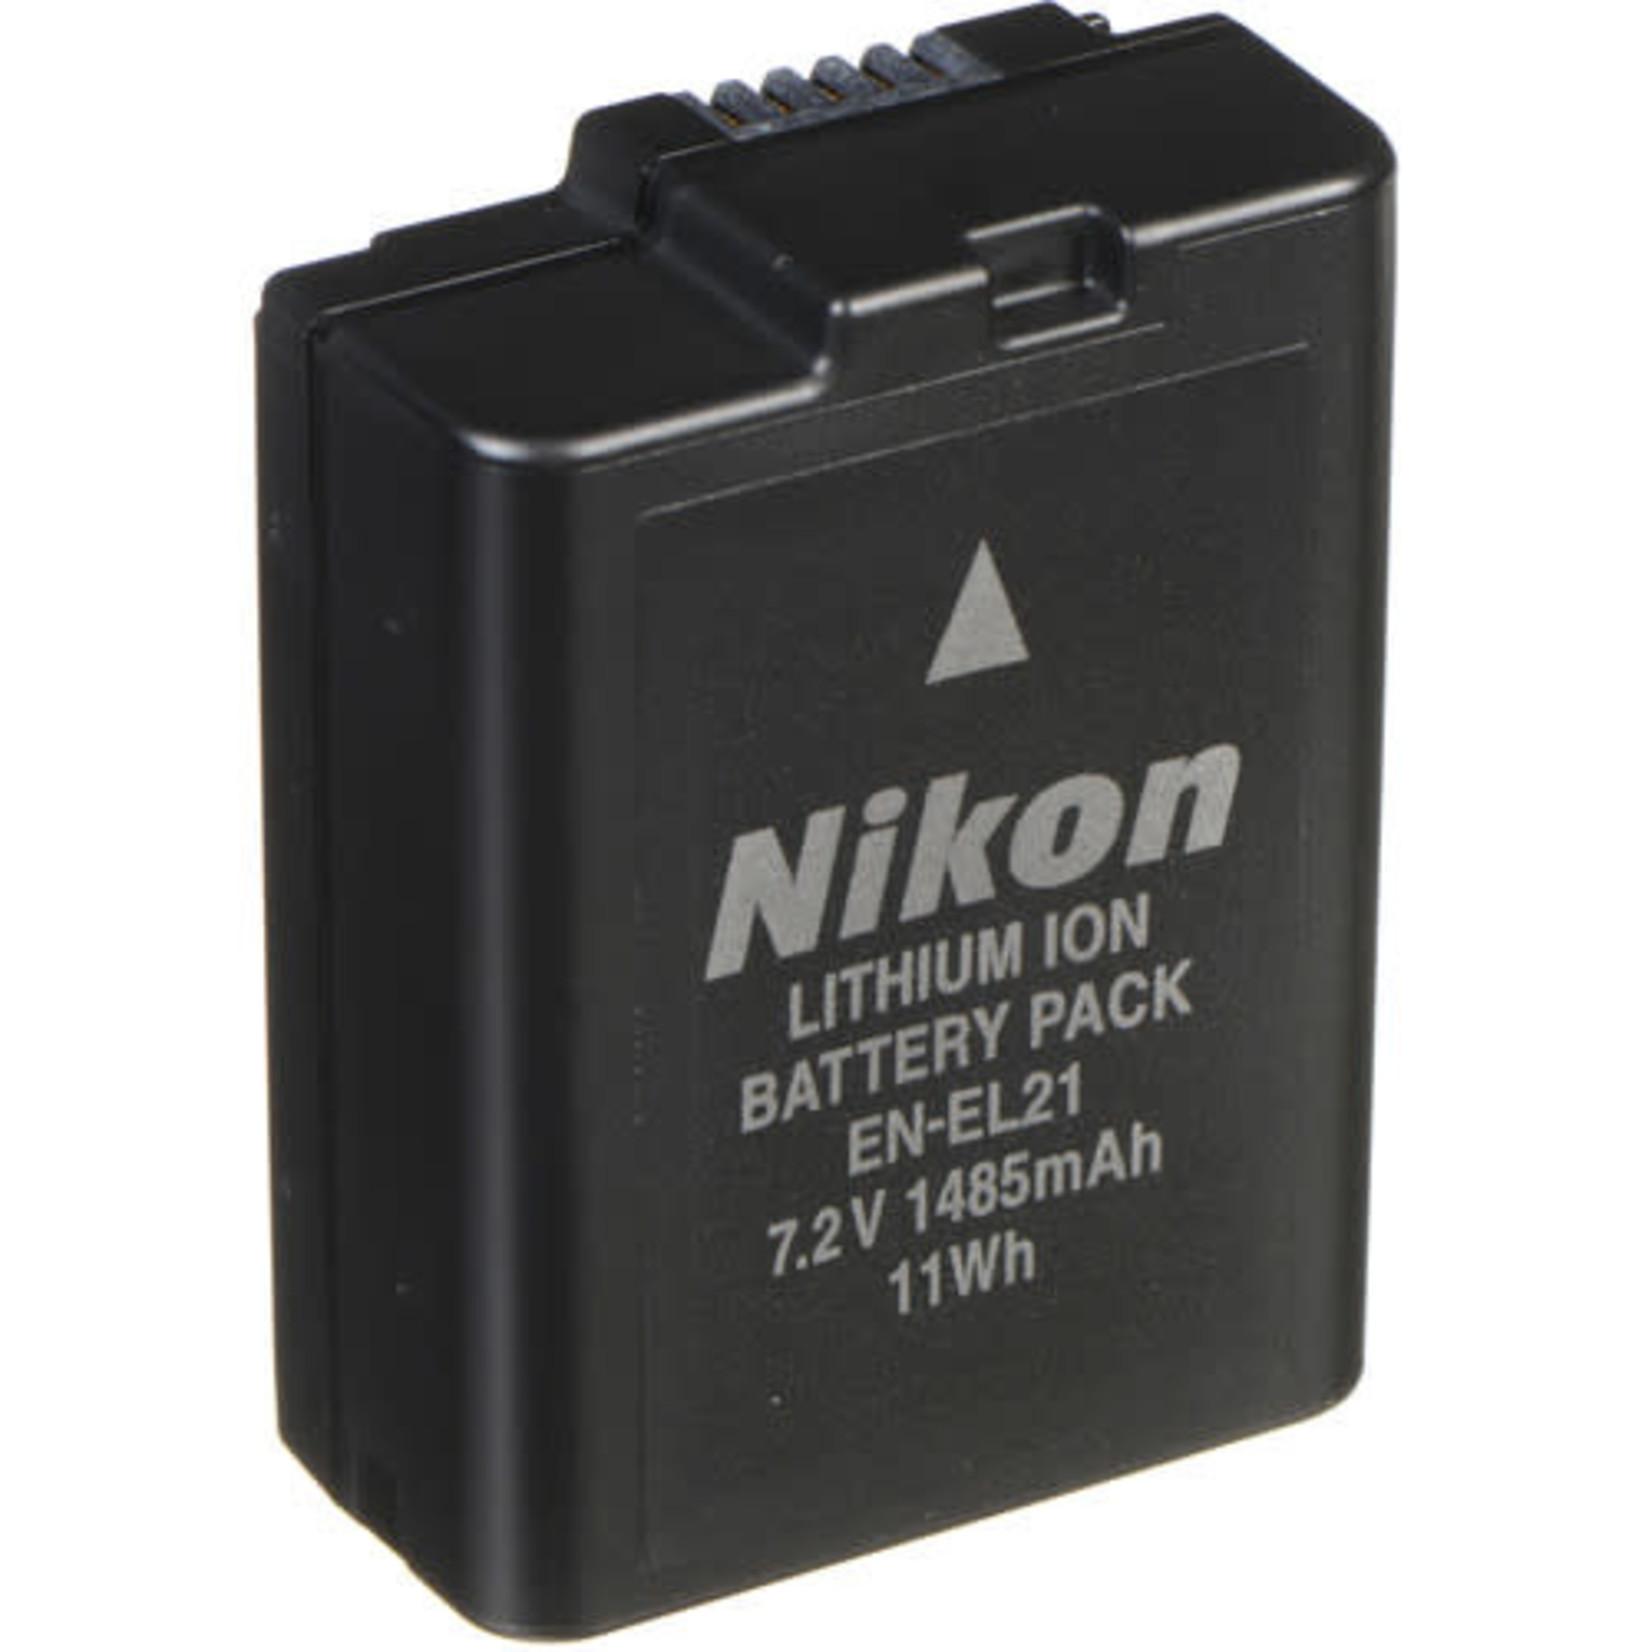 Nikon EN-EL21 Nikon EN-EL21 Rechargeable Li-Ion Battery LI-ION BATTERY